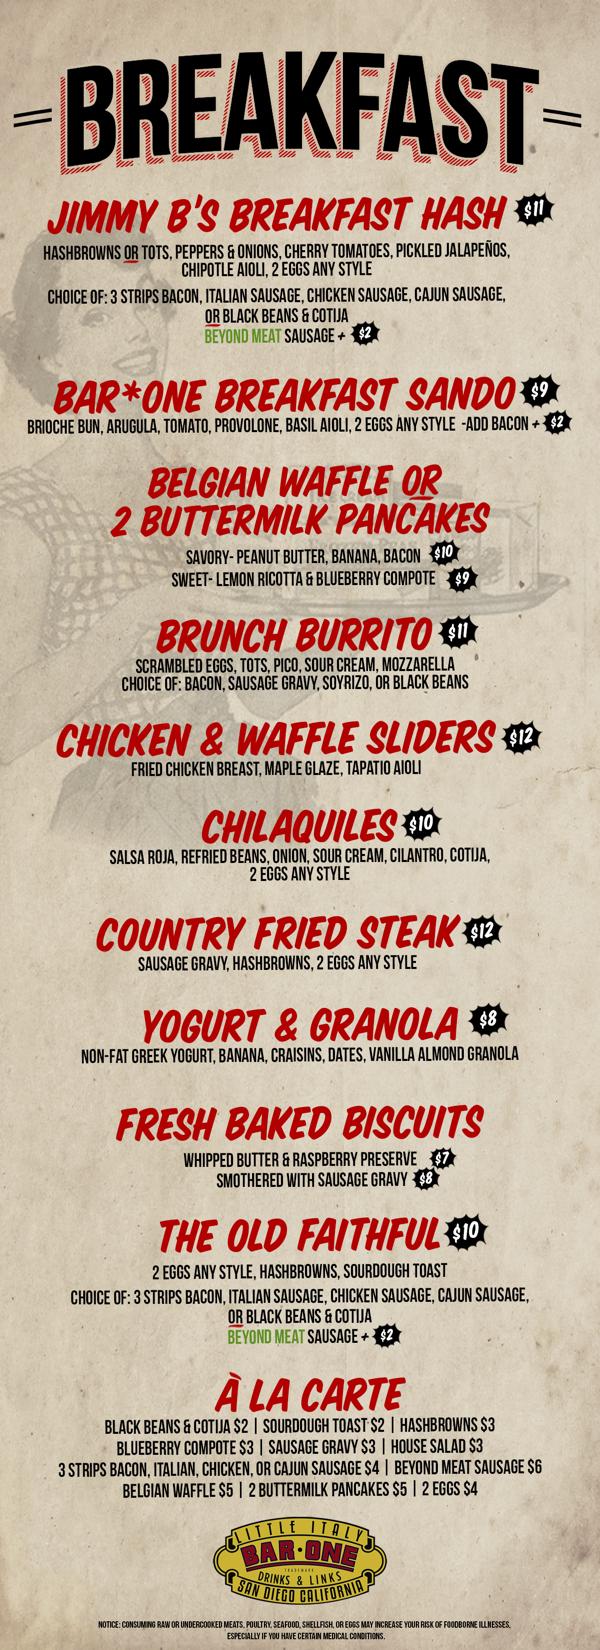 b1 breakfast menu.jpg